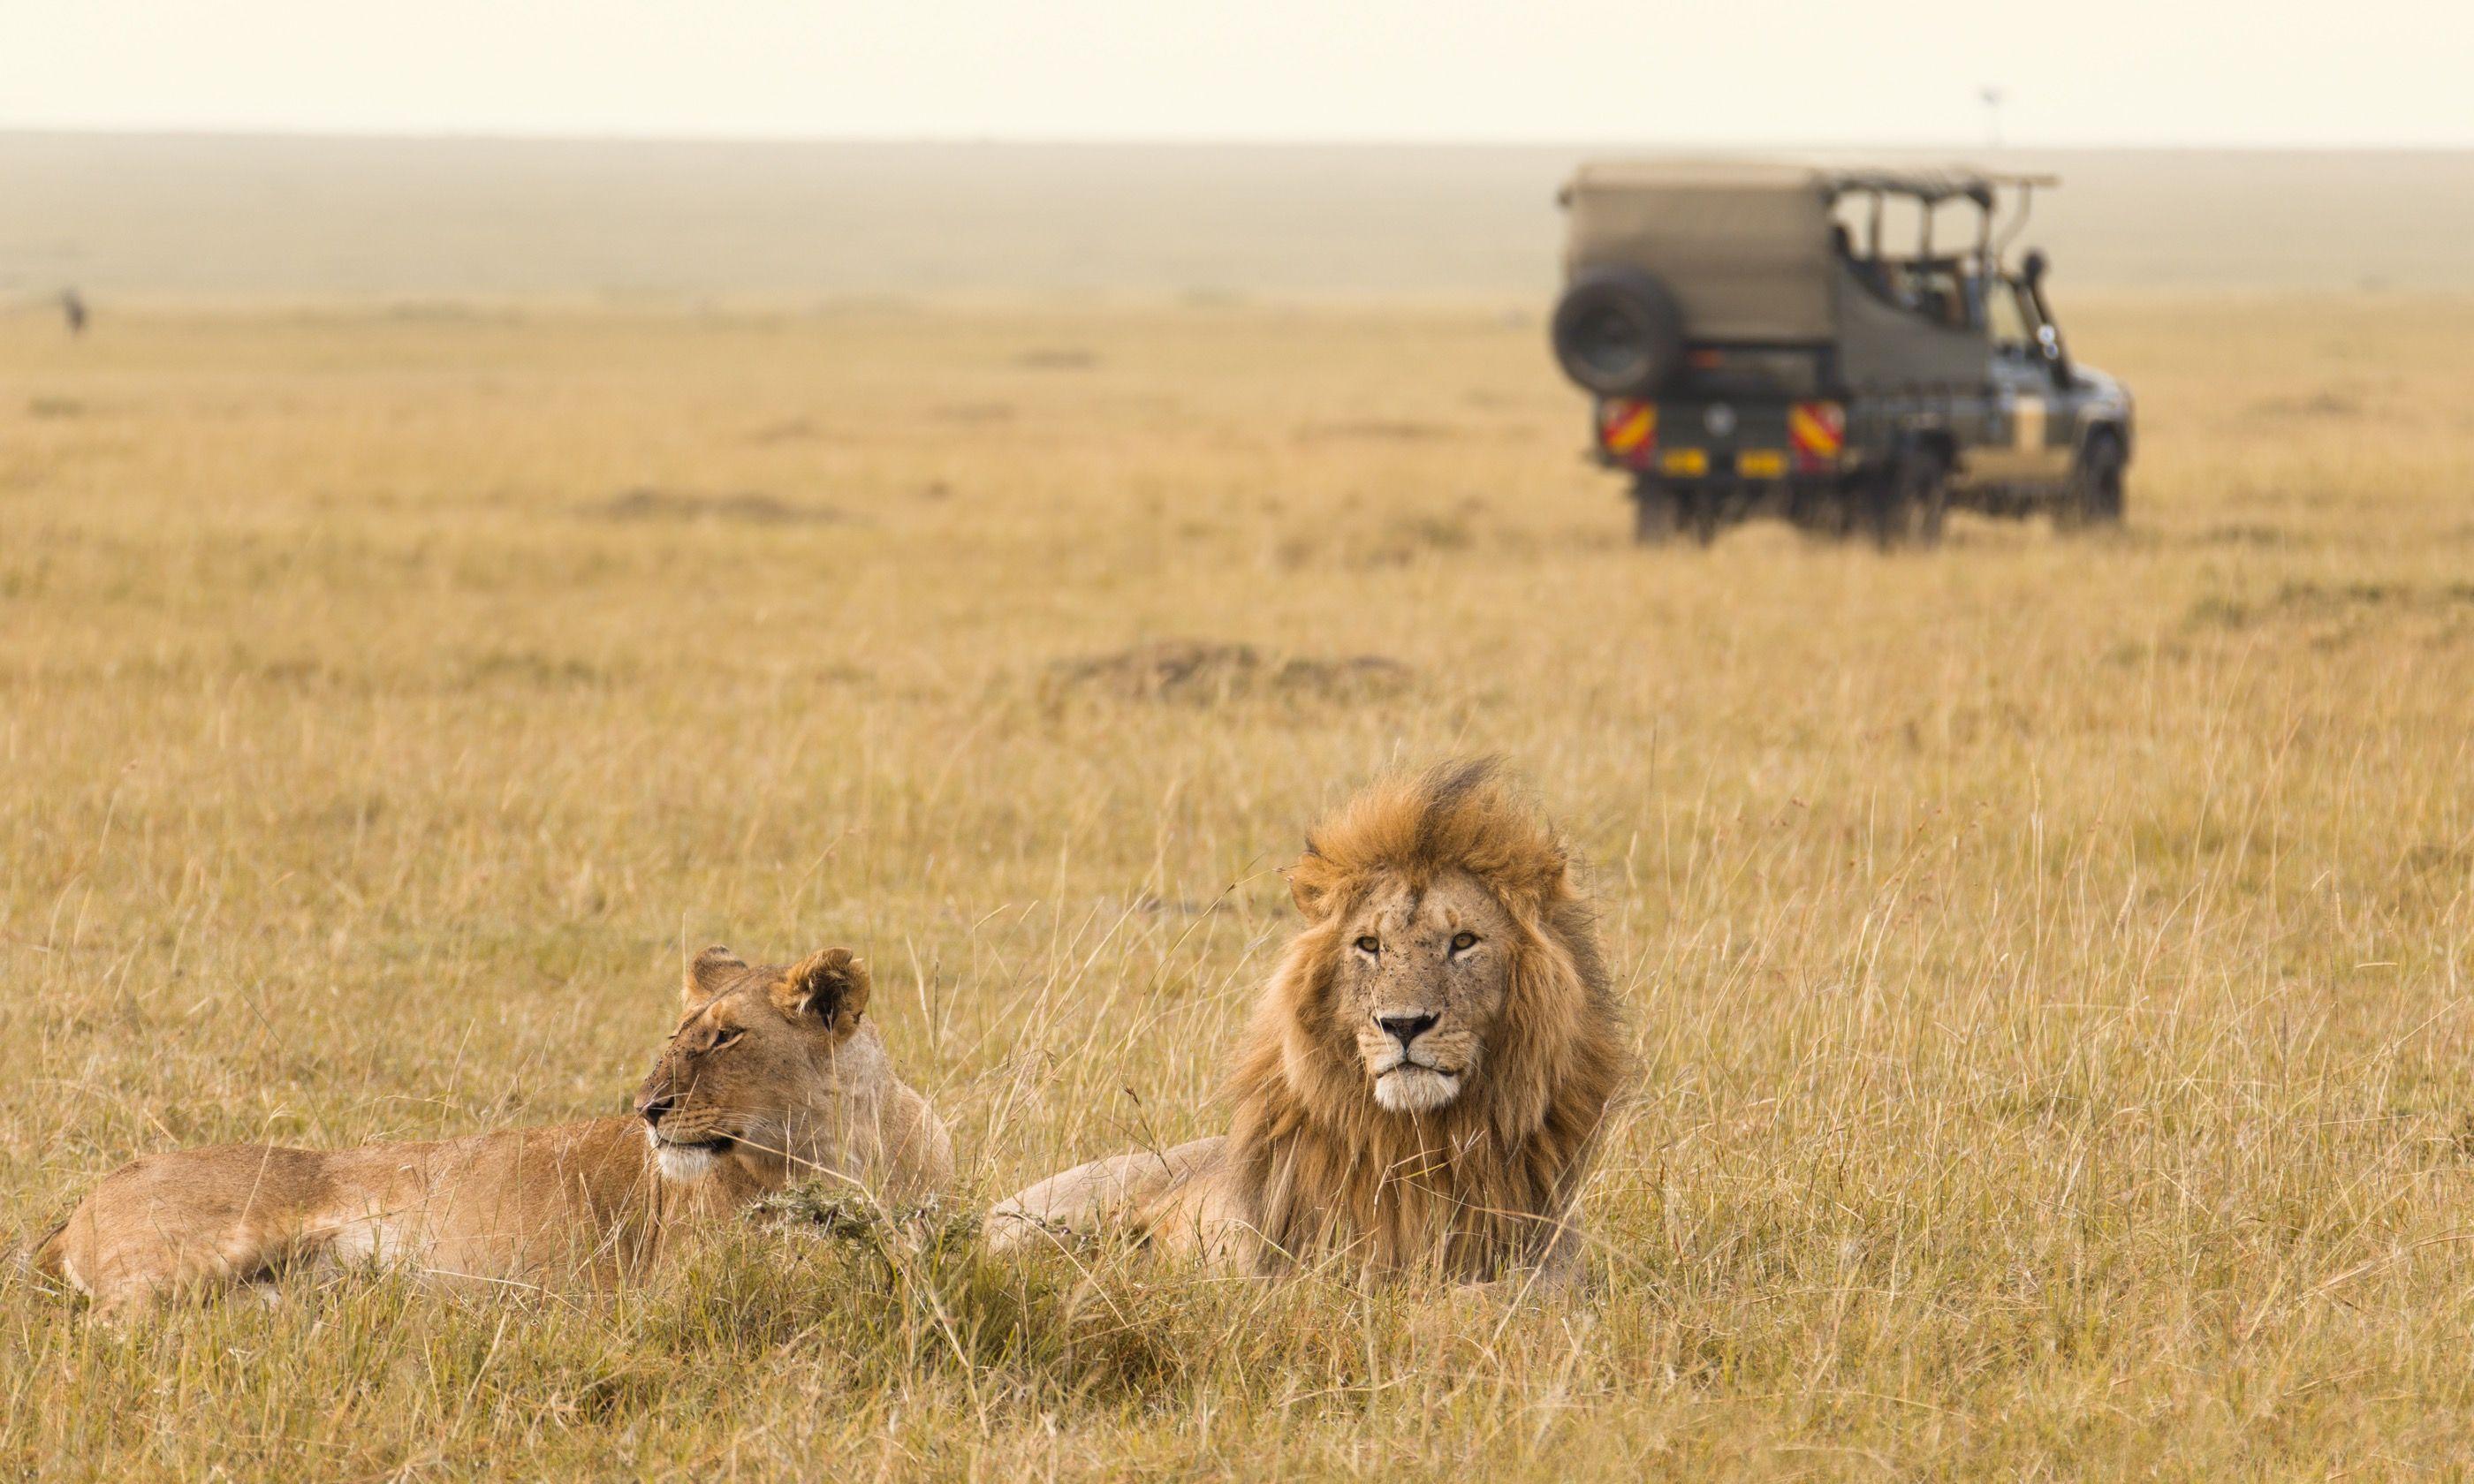 Lions in Kenya (Shutterstock.com)